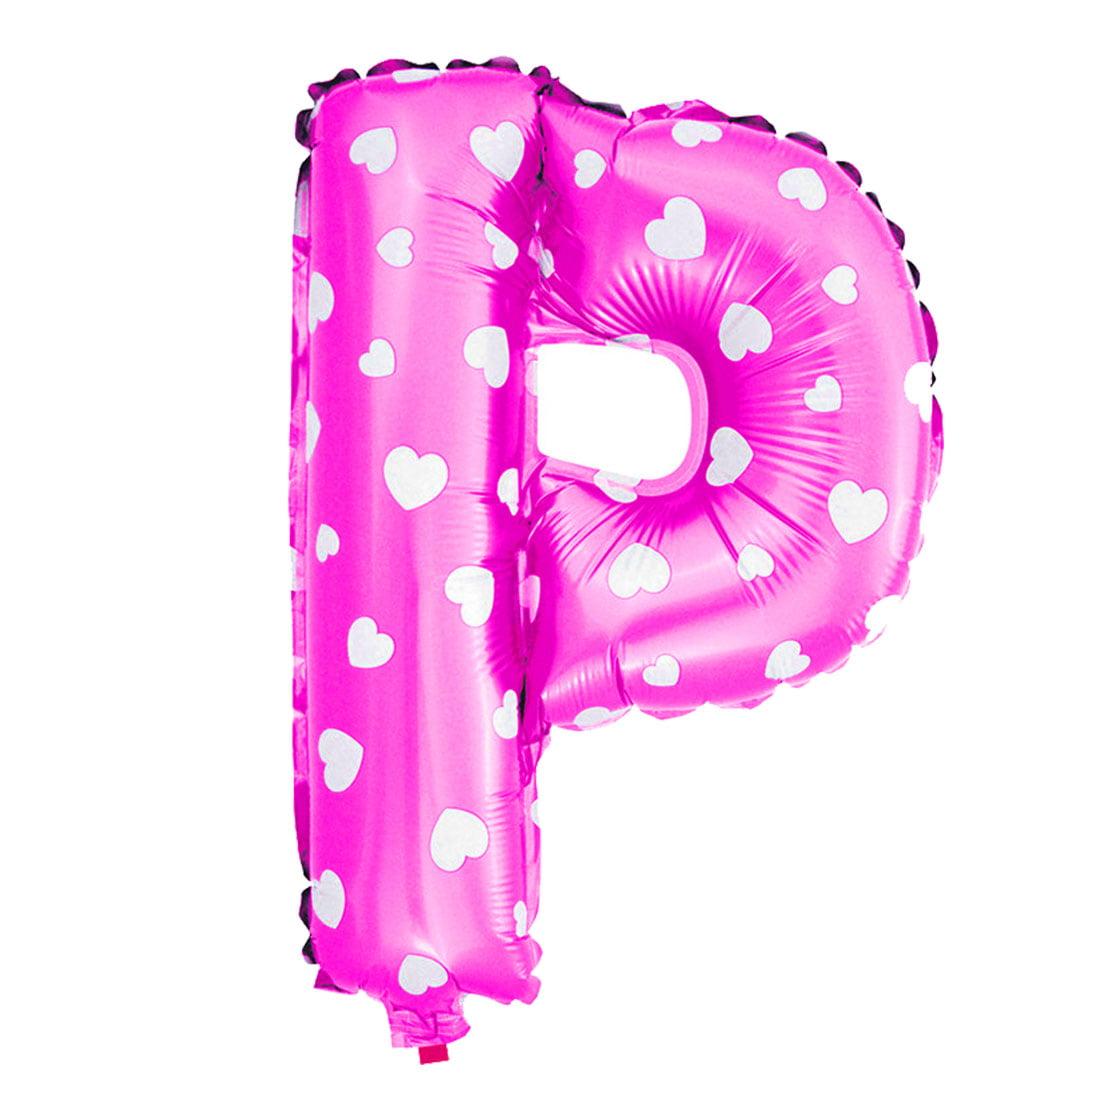 "Unique Bargains Foil Letter P Heart Pattern Helium Balloon Birthday Wedding Decor Fuchsia 16"""